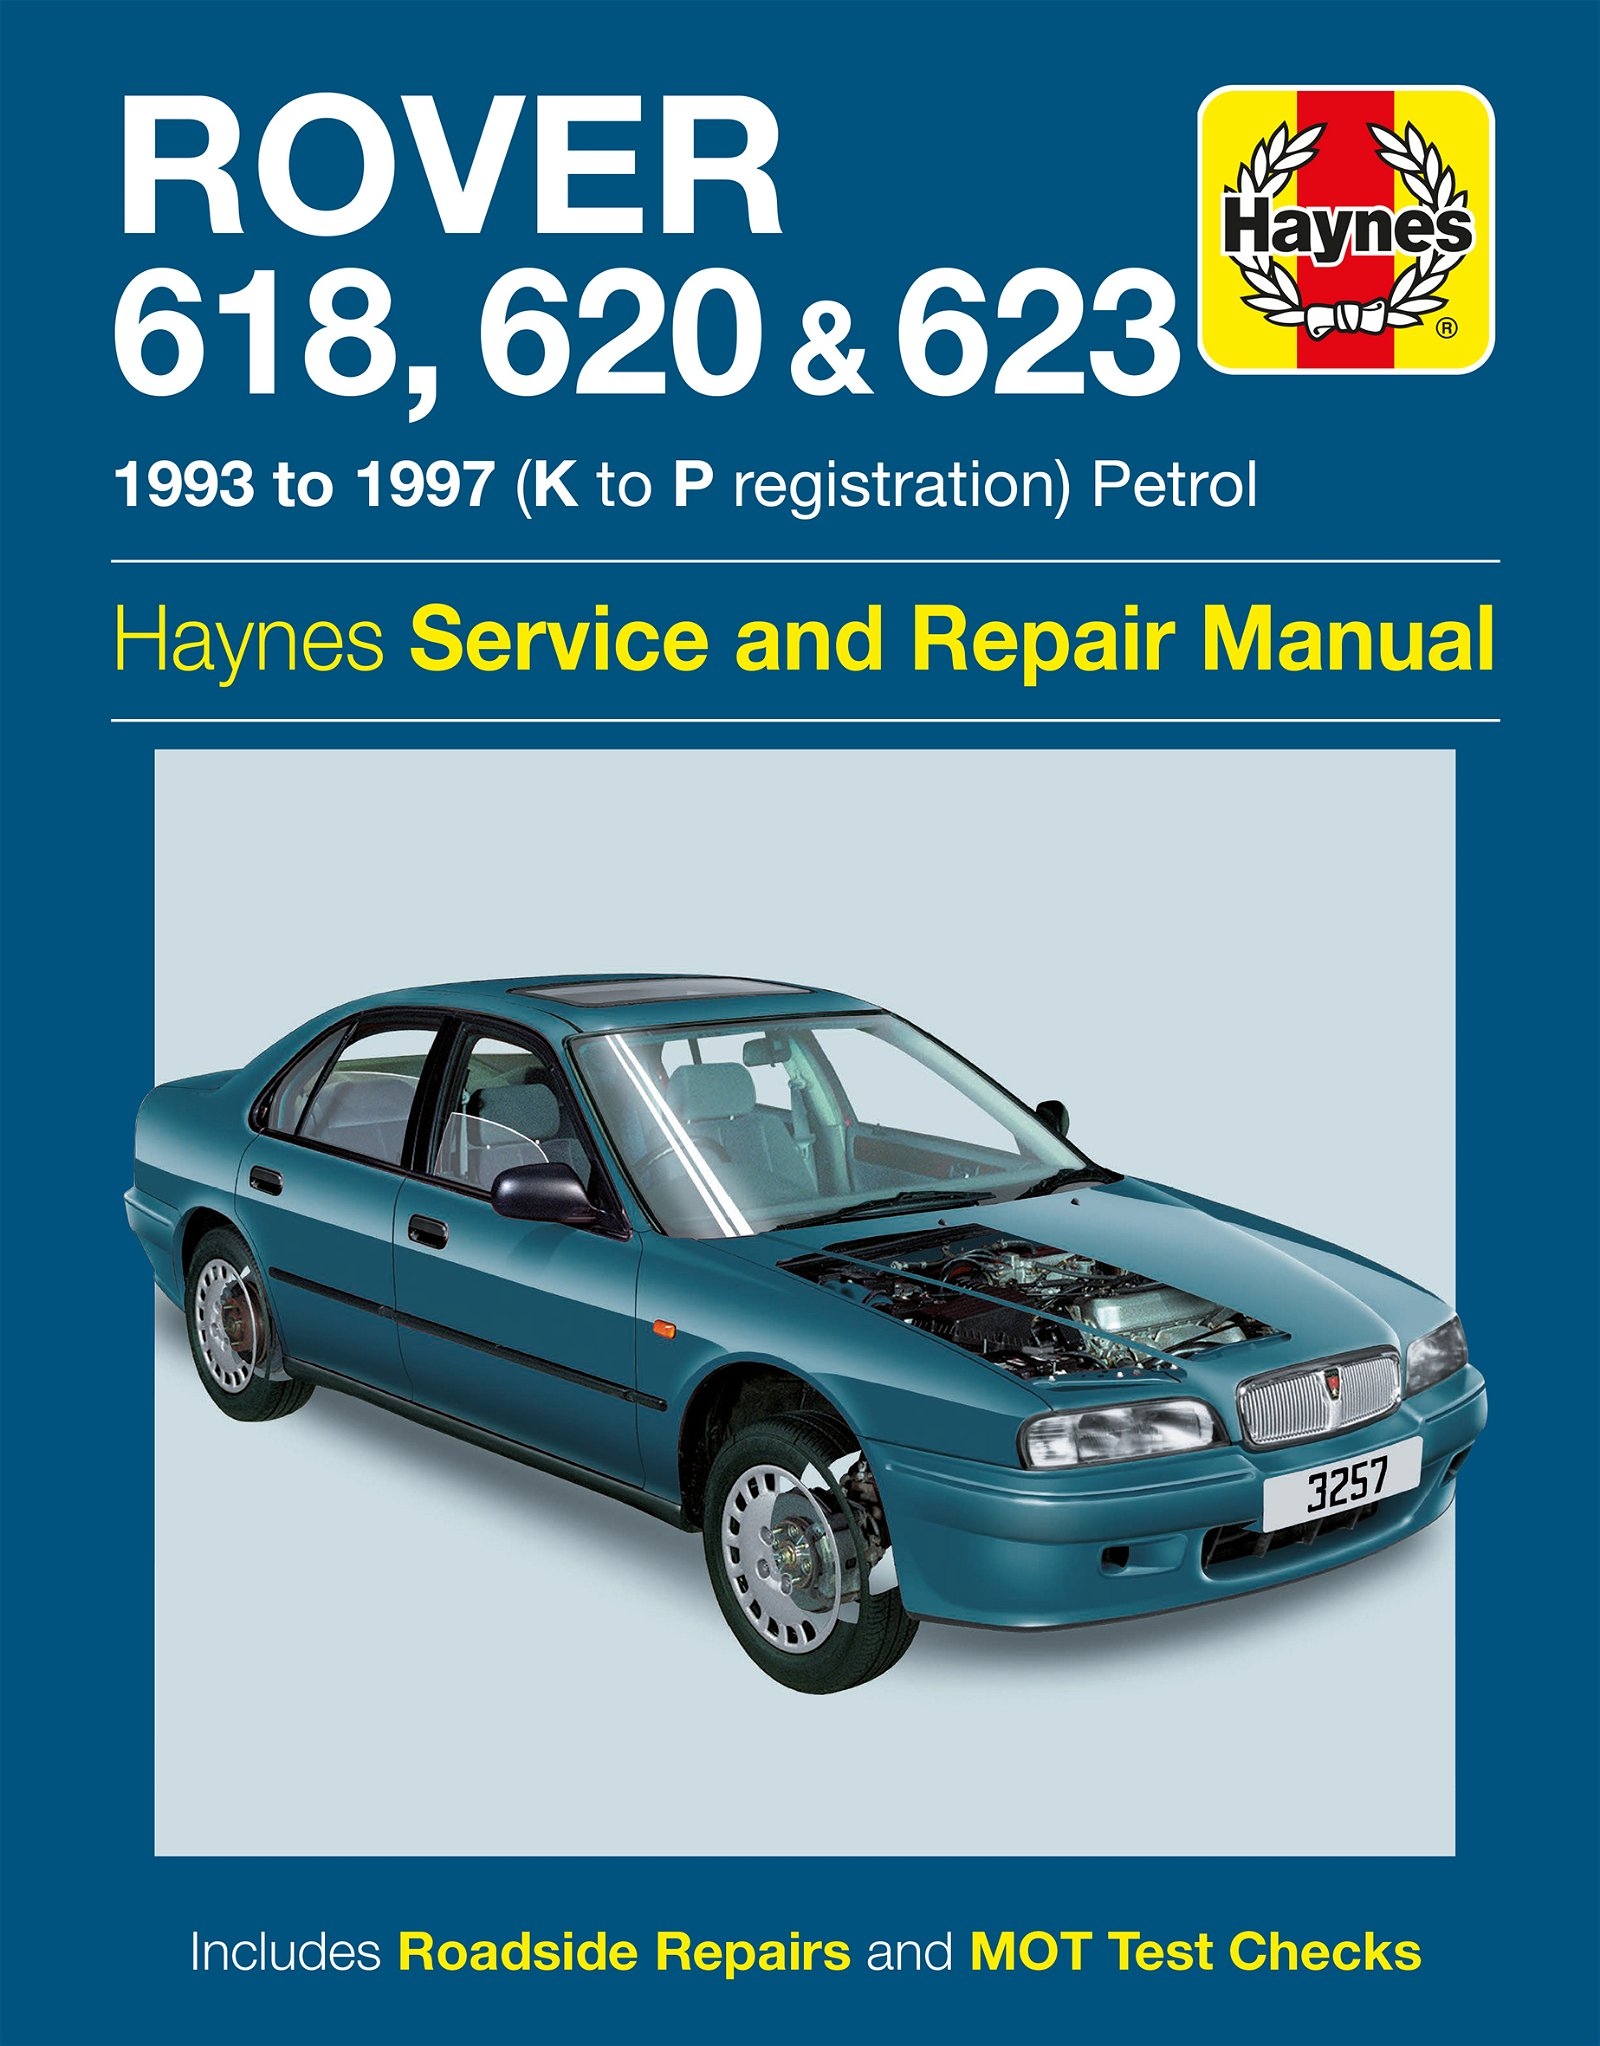 [Manuel UK en Anglais] Rover 618, 620 & 623 Petrol  (93 - 97)  K to P